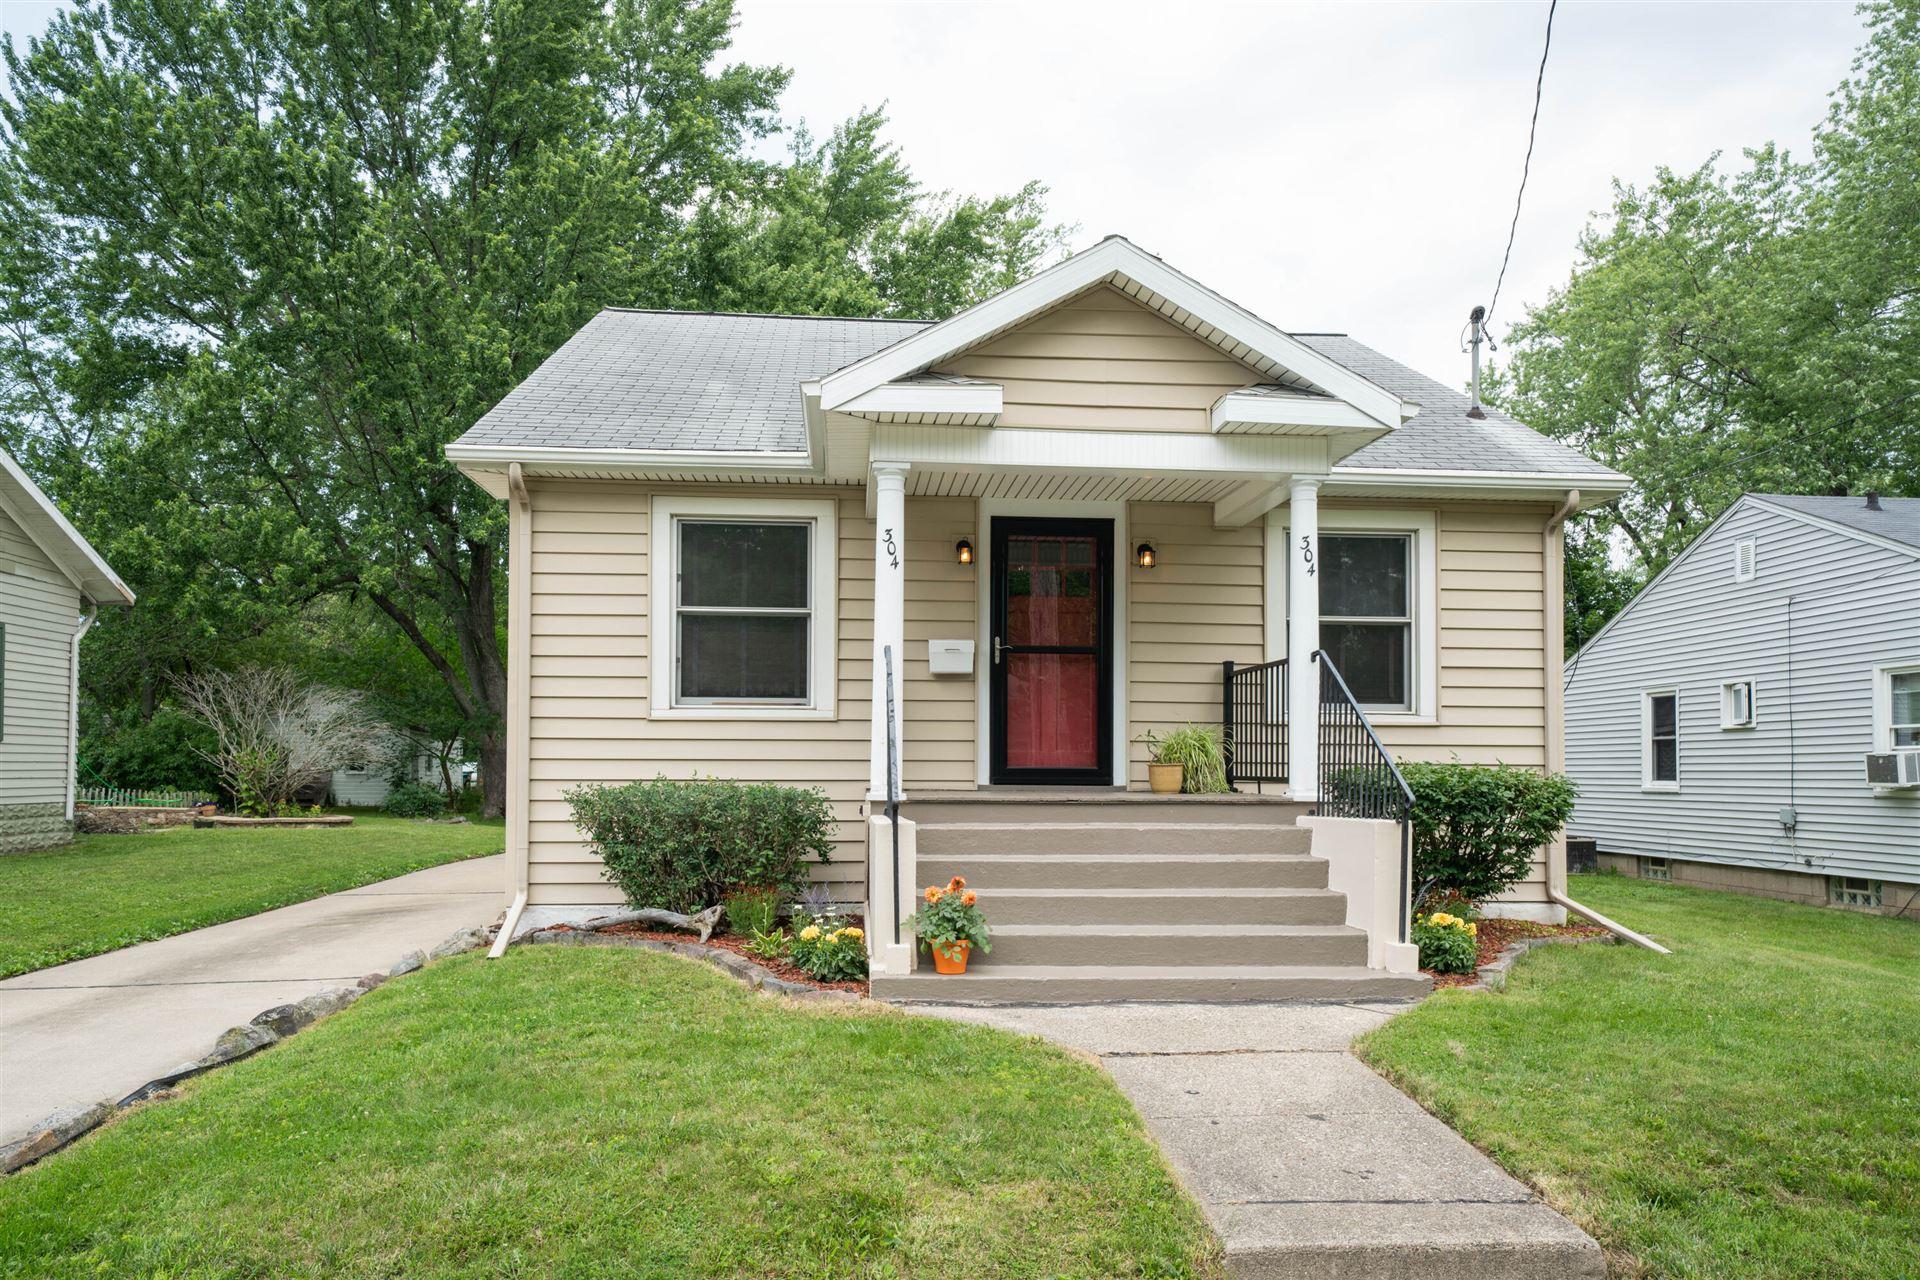 304 Whitcomb Street, Kalamazoo, MI 49001 - MLS#: 21026077